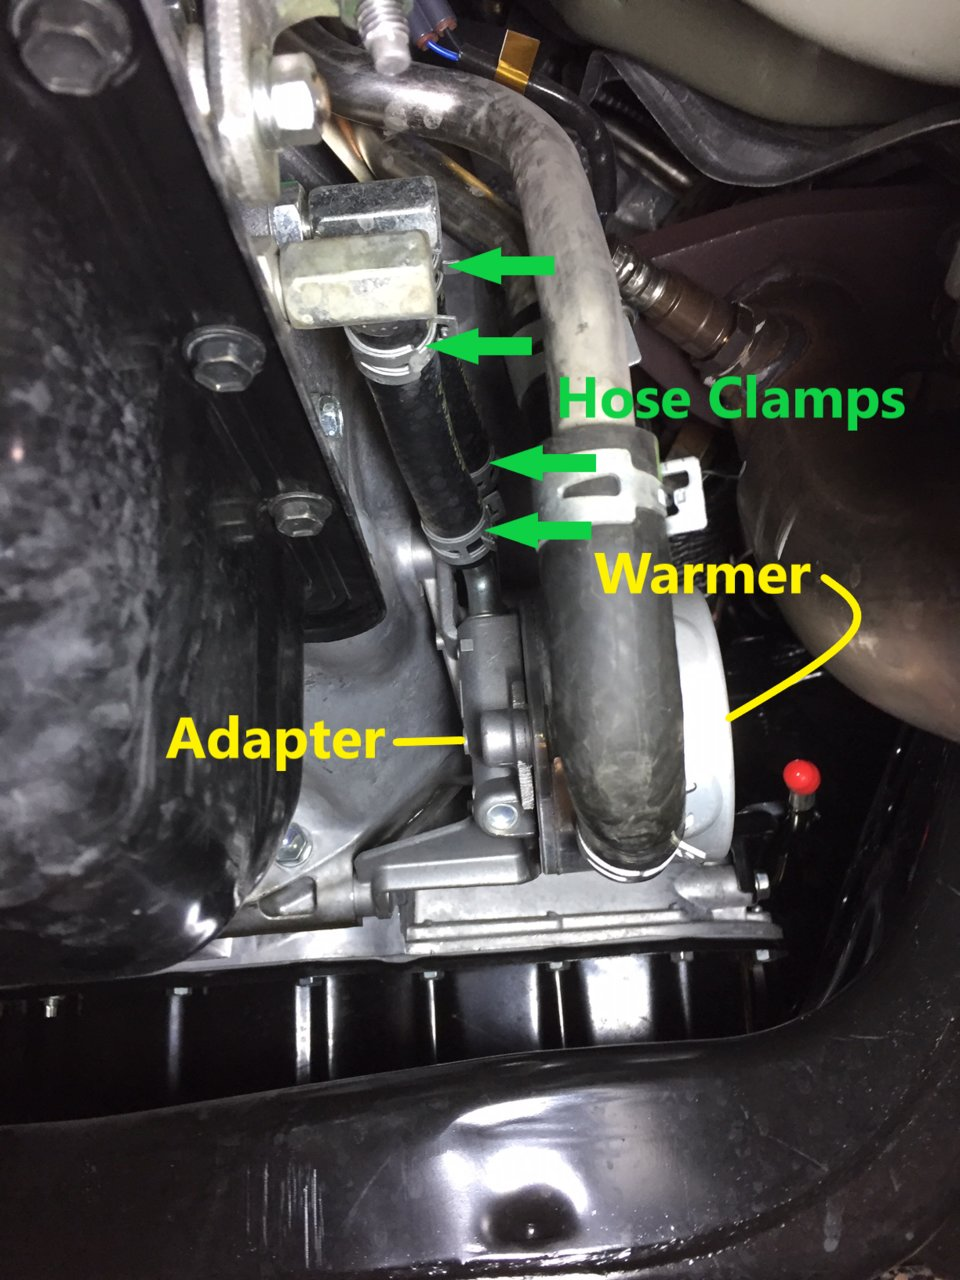 Hose clamps.jpg